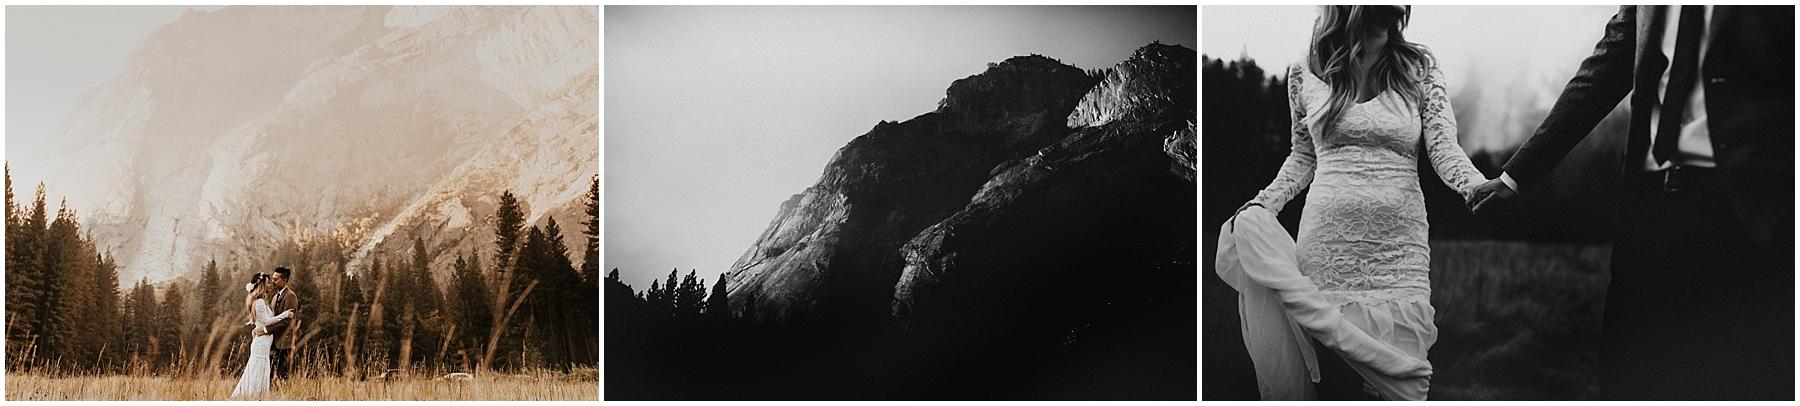 Yosemite_elopement_0024.jpg